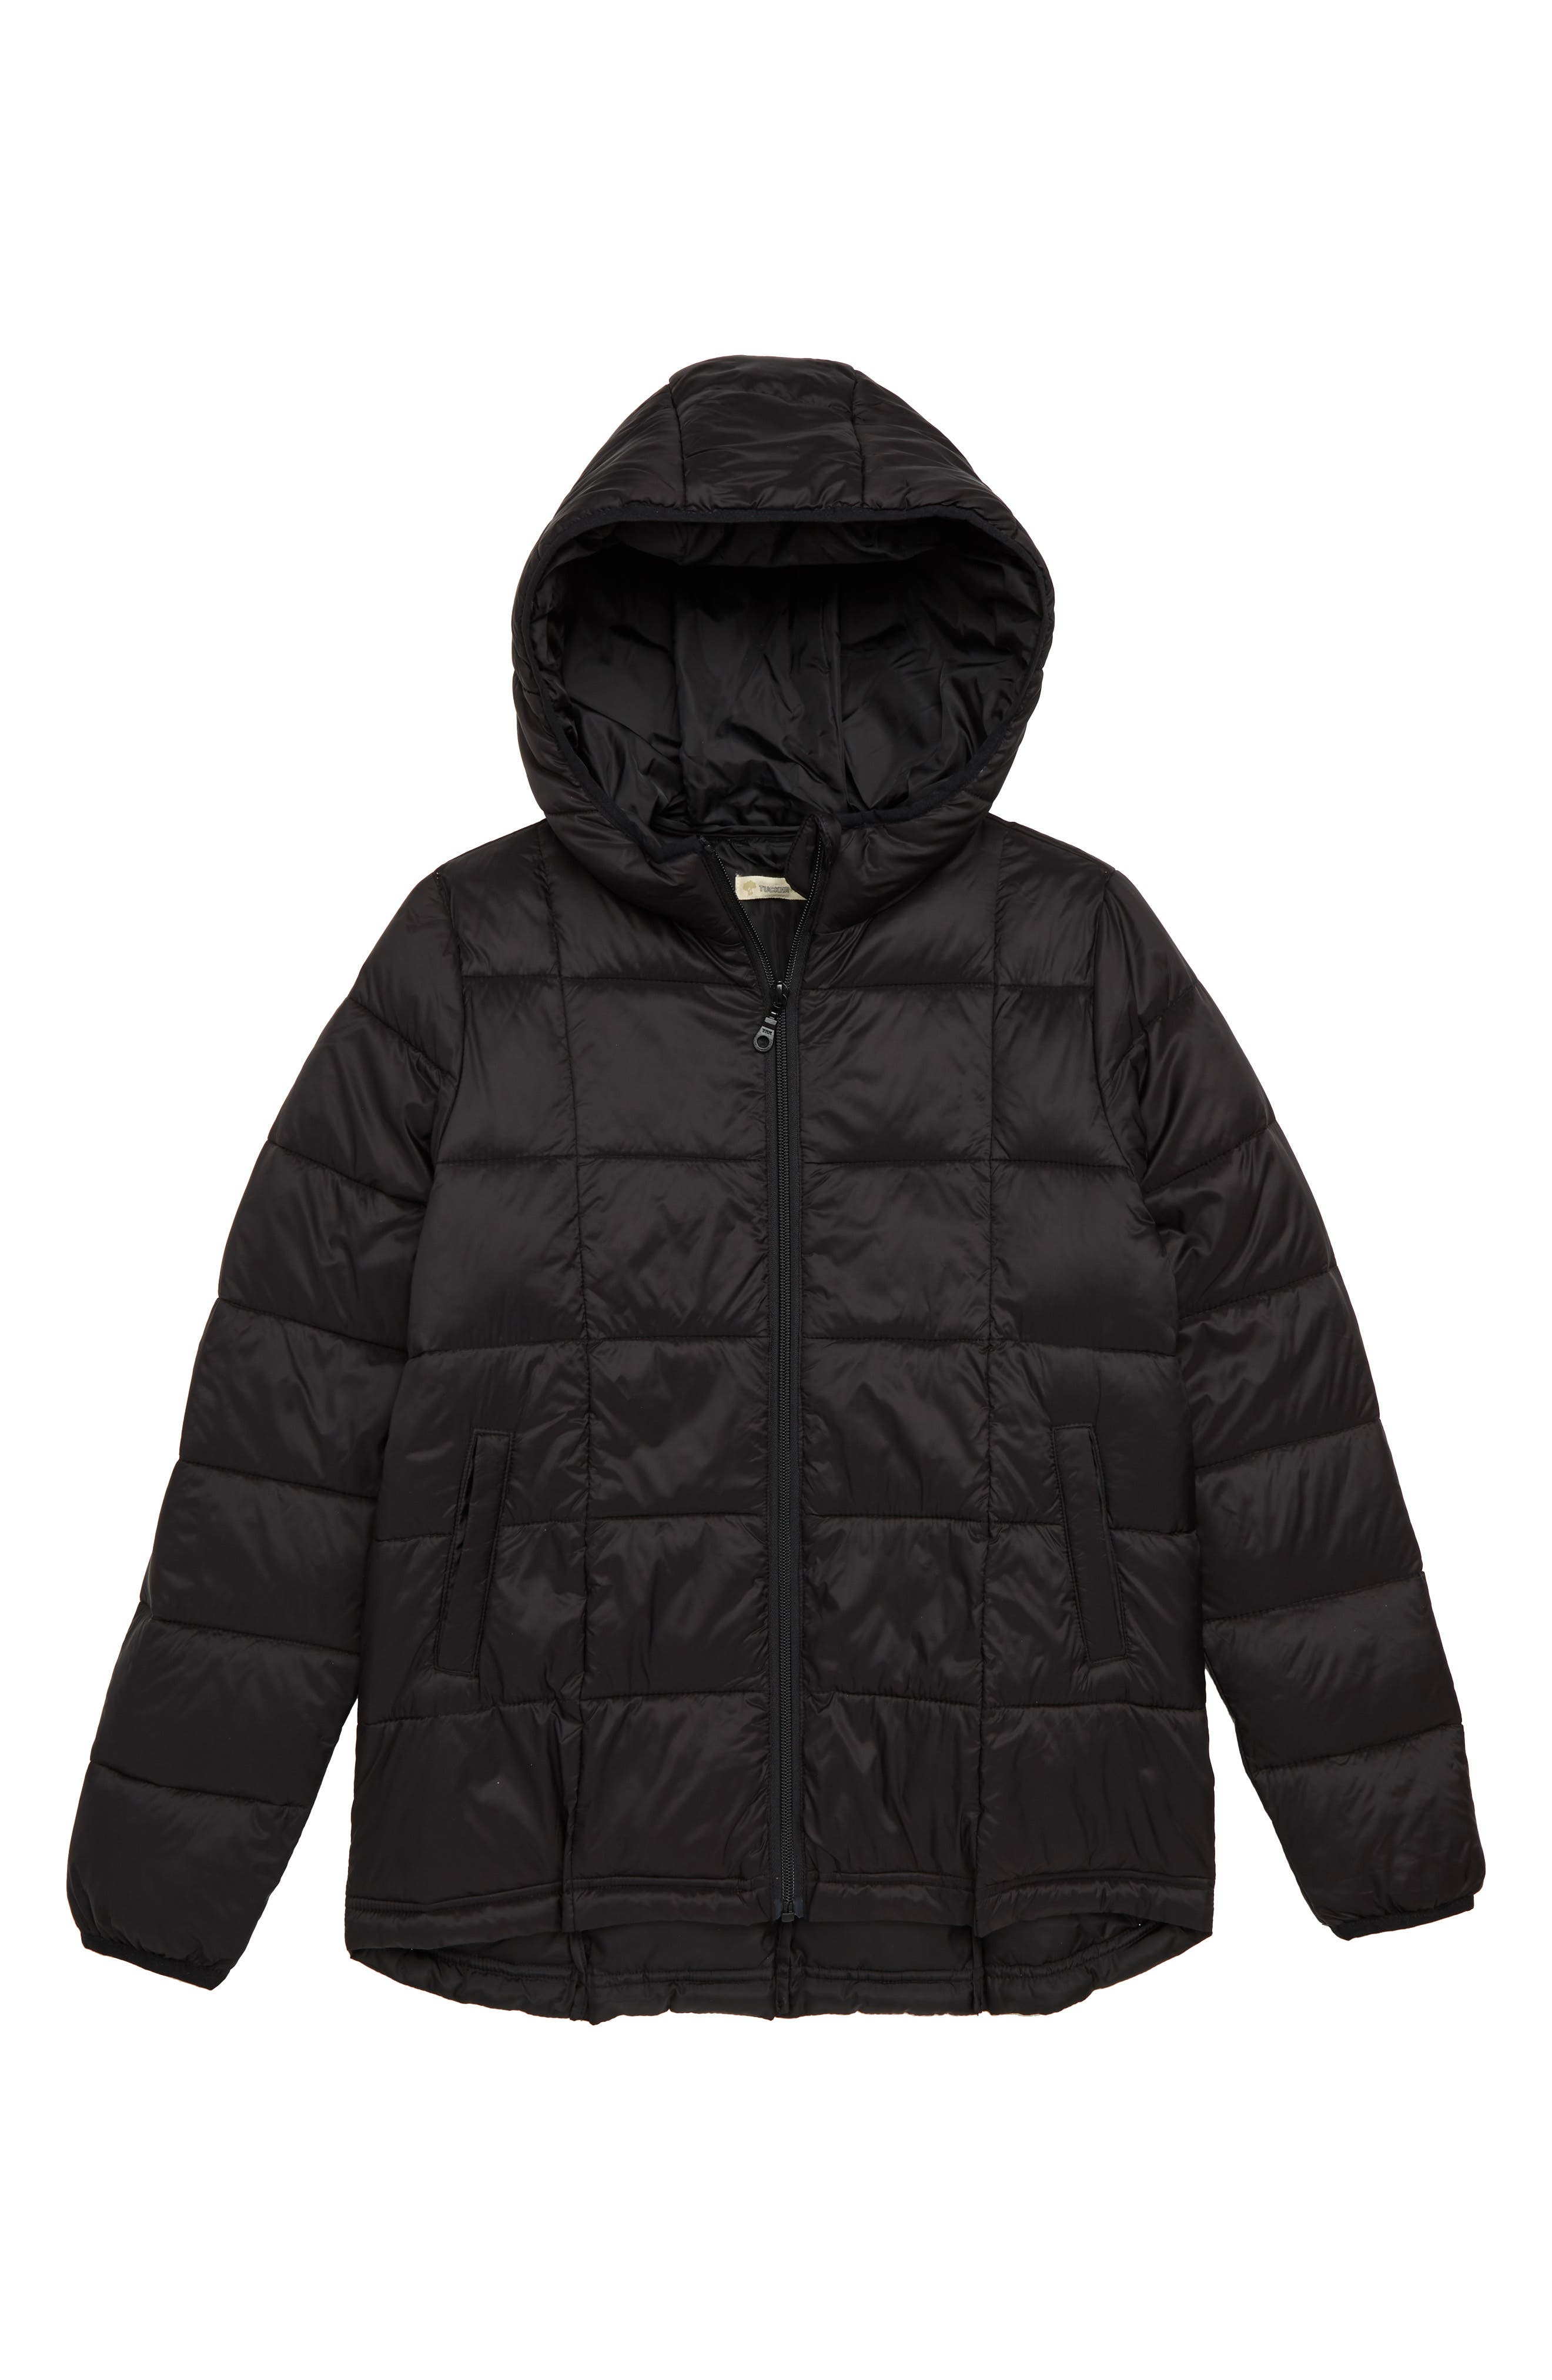 Packable Puffer Jacket,                             Main thumbnail 1, color,                             001